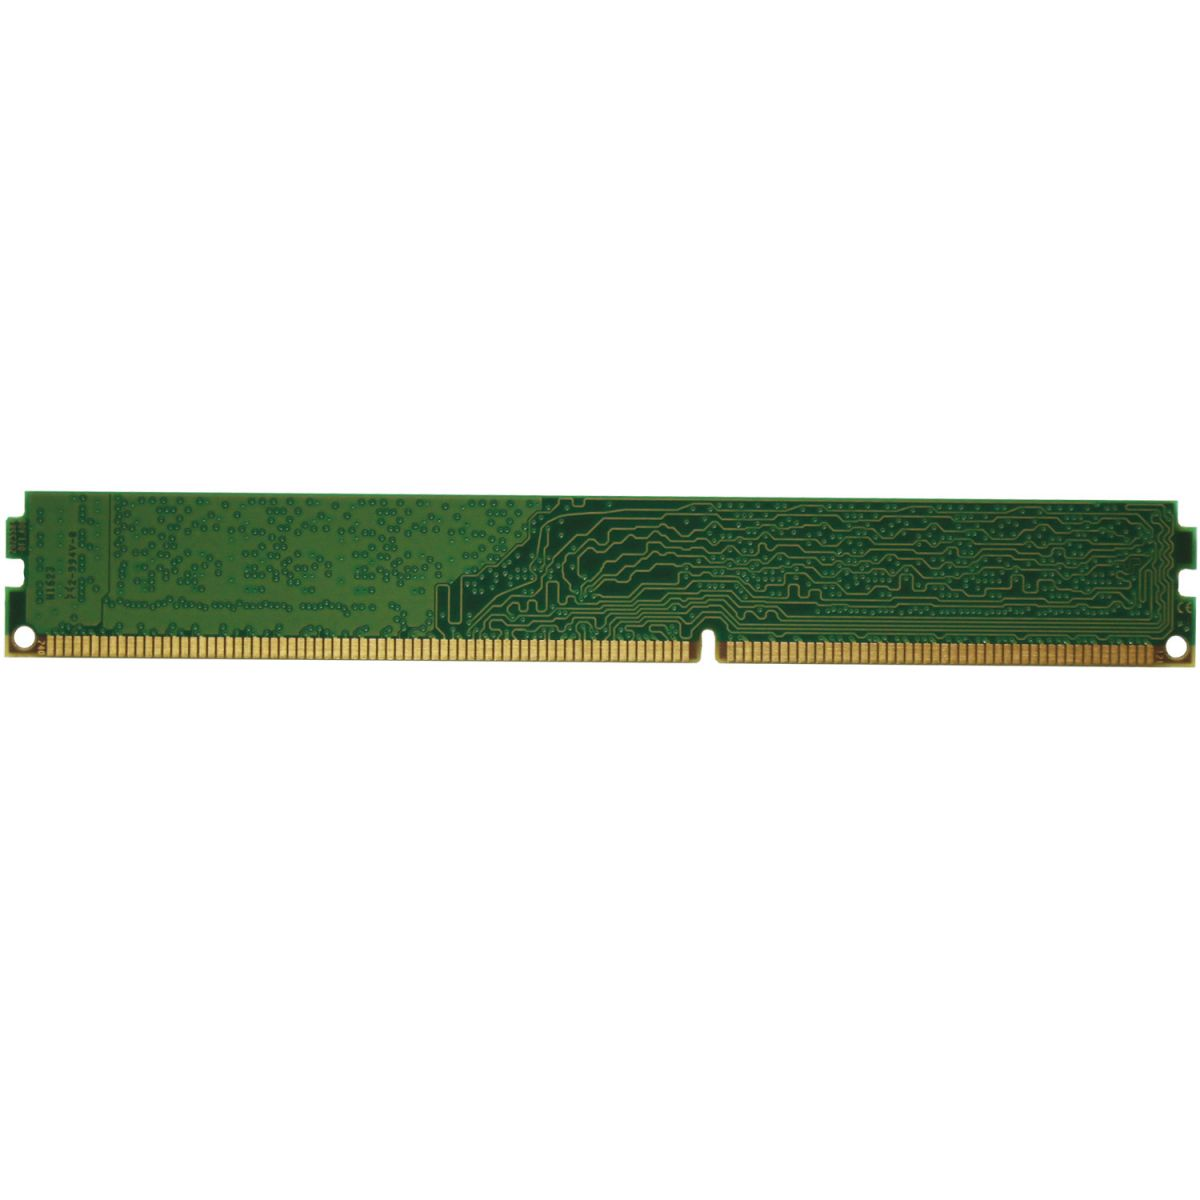 Memória Kingston DDR3 4GB 1600Mhz KCP316NS8/4 Para PC Dell HP Acer Lenovo